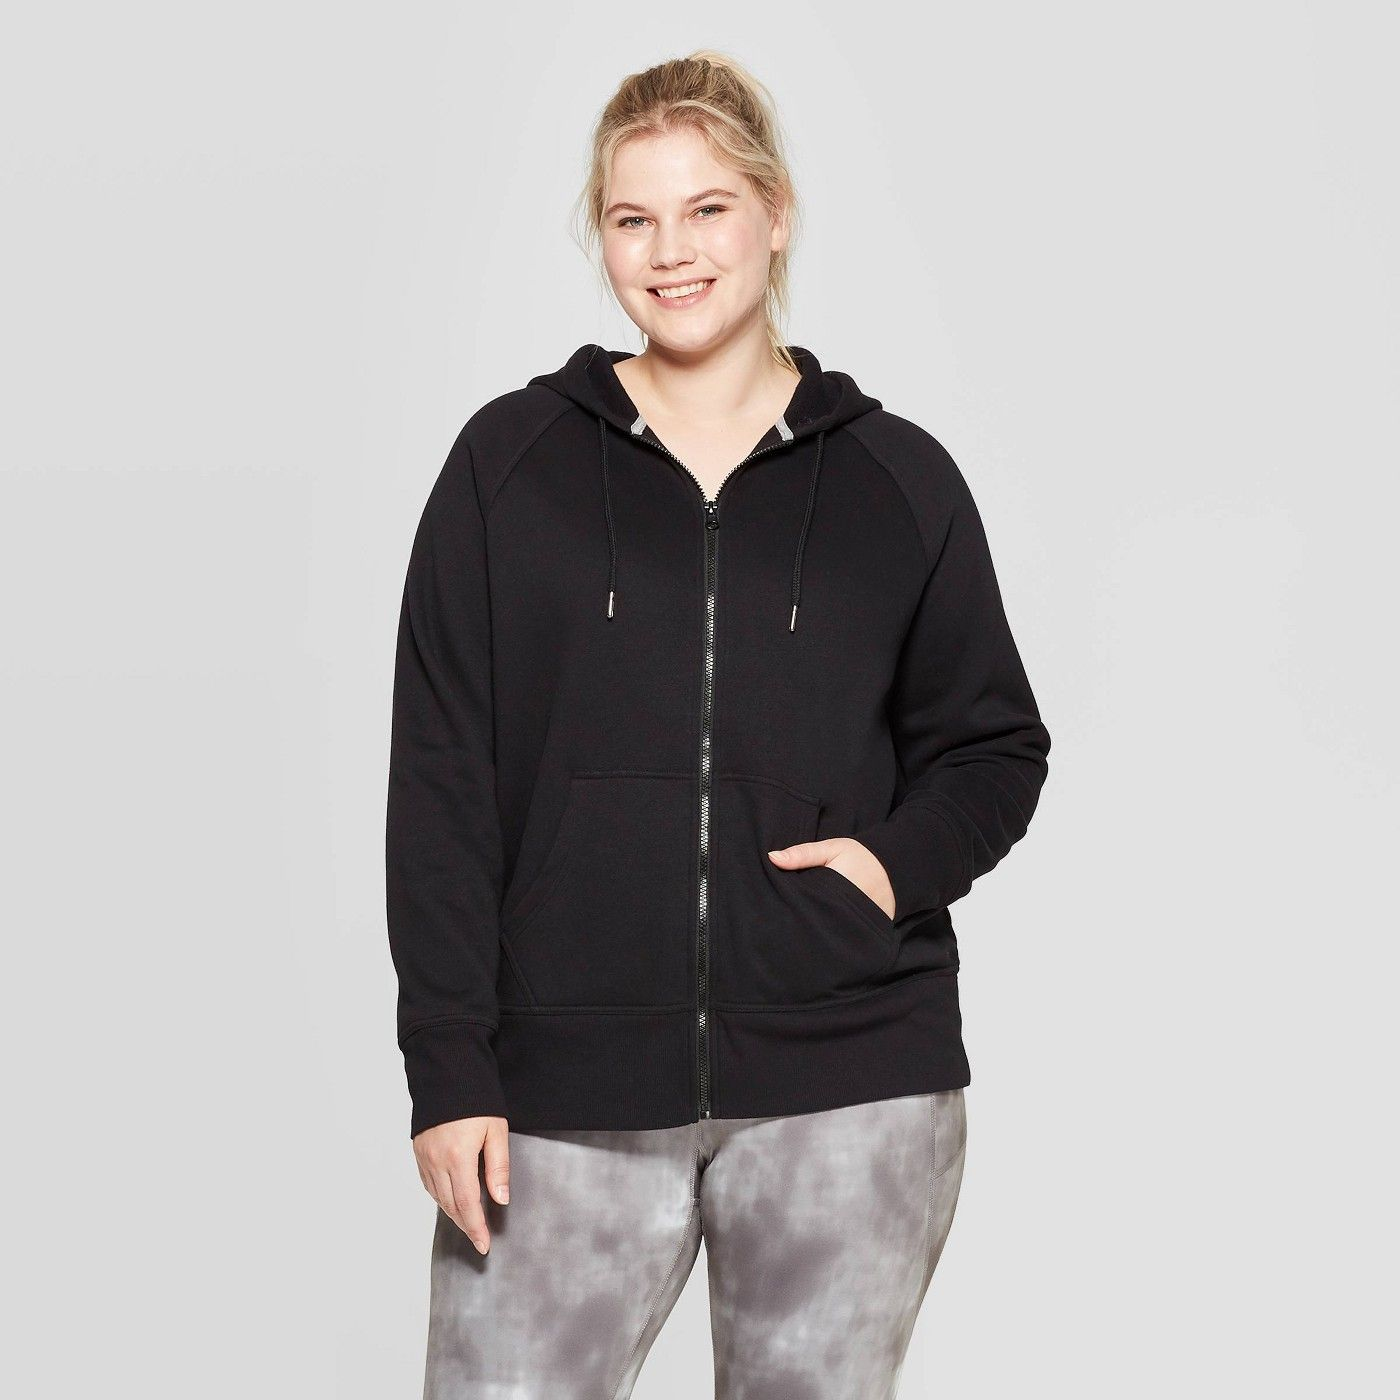 Women's Plus Size Authentic Fleece Sweatshirt Full Zip - C9 Champion? #Affiliate... 8